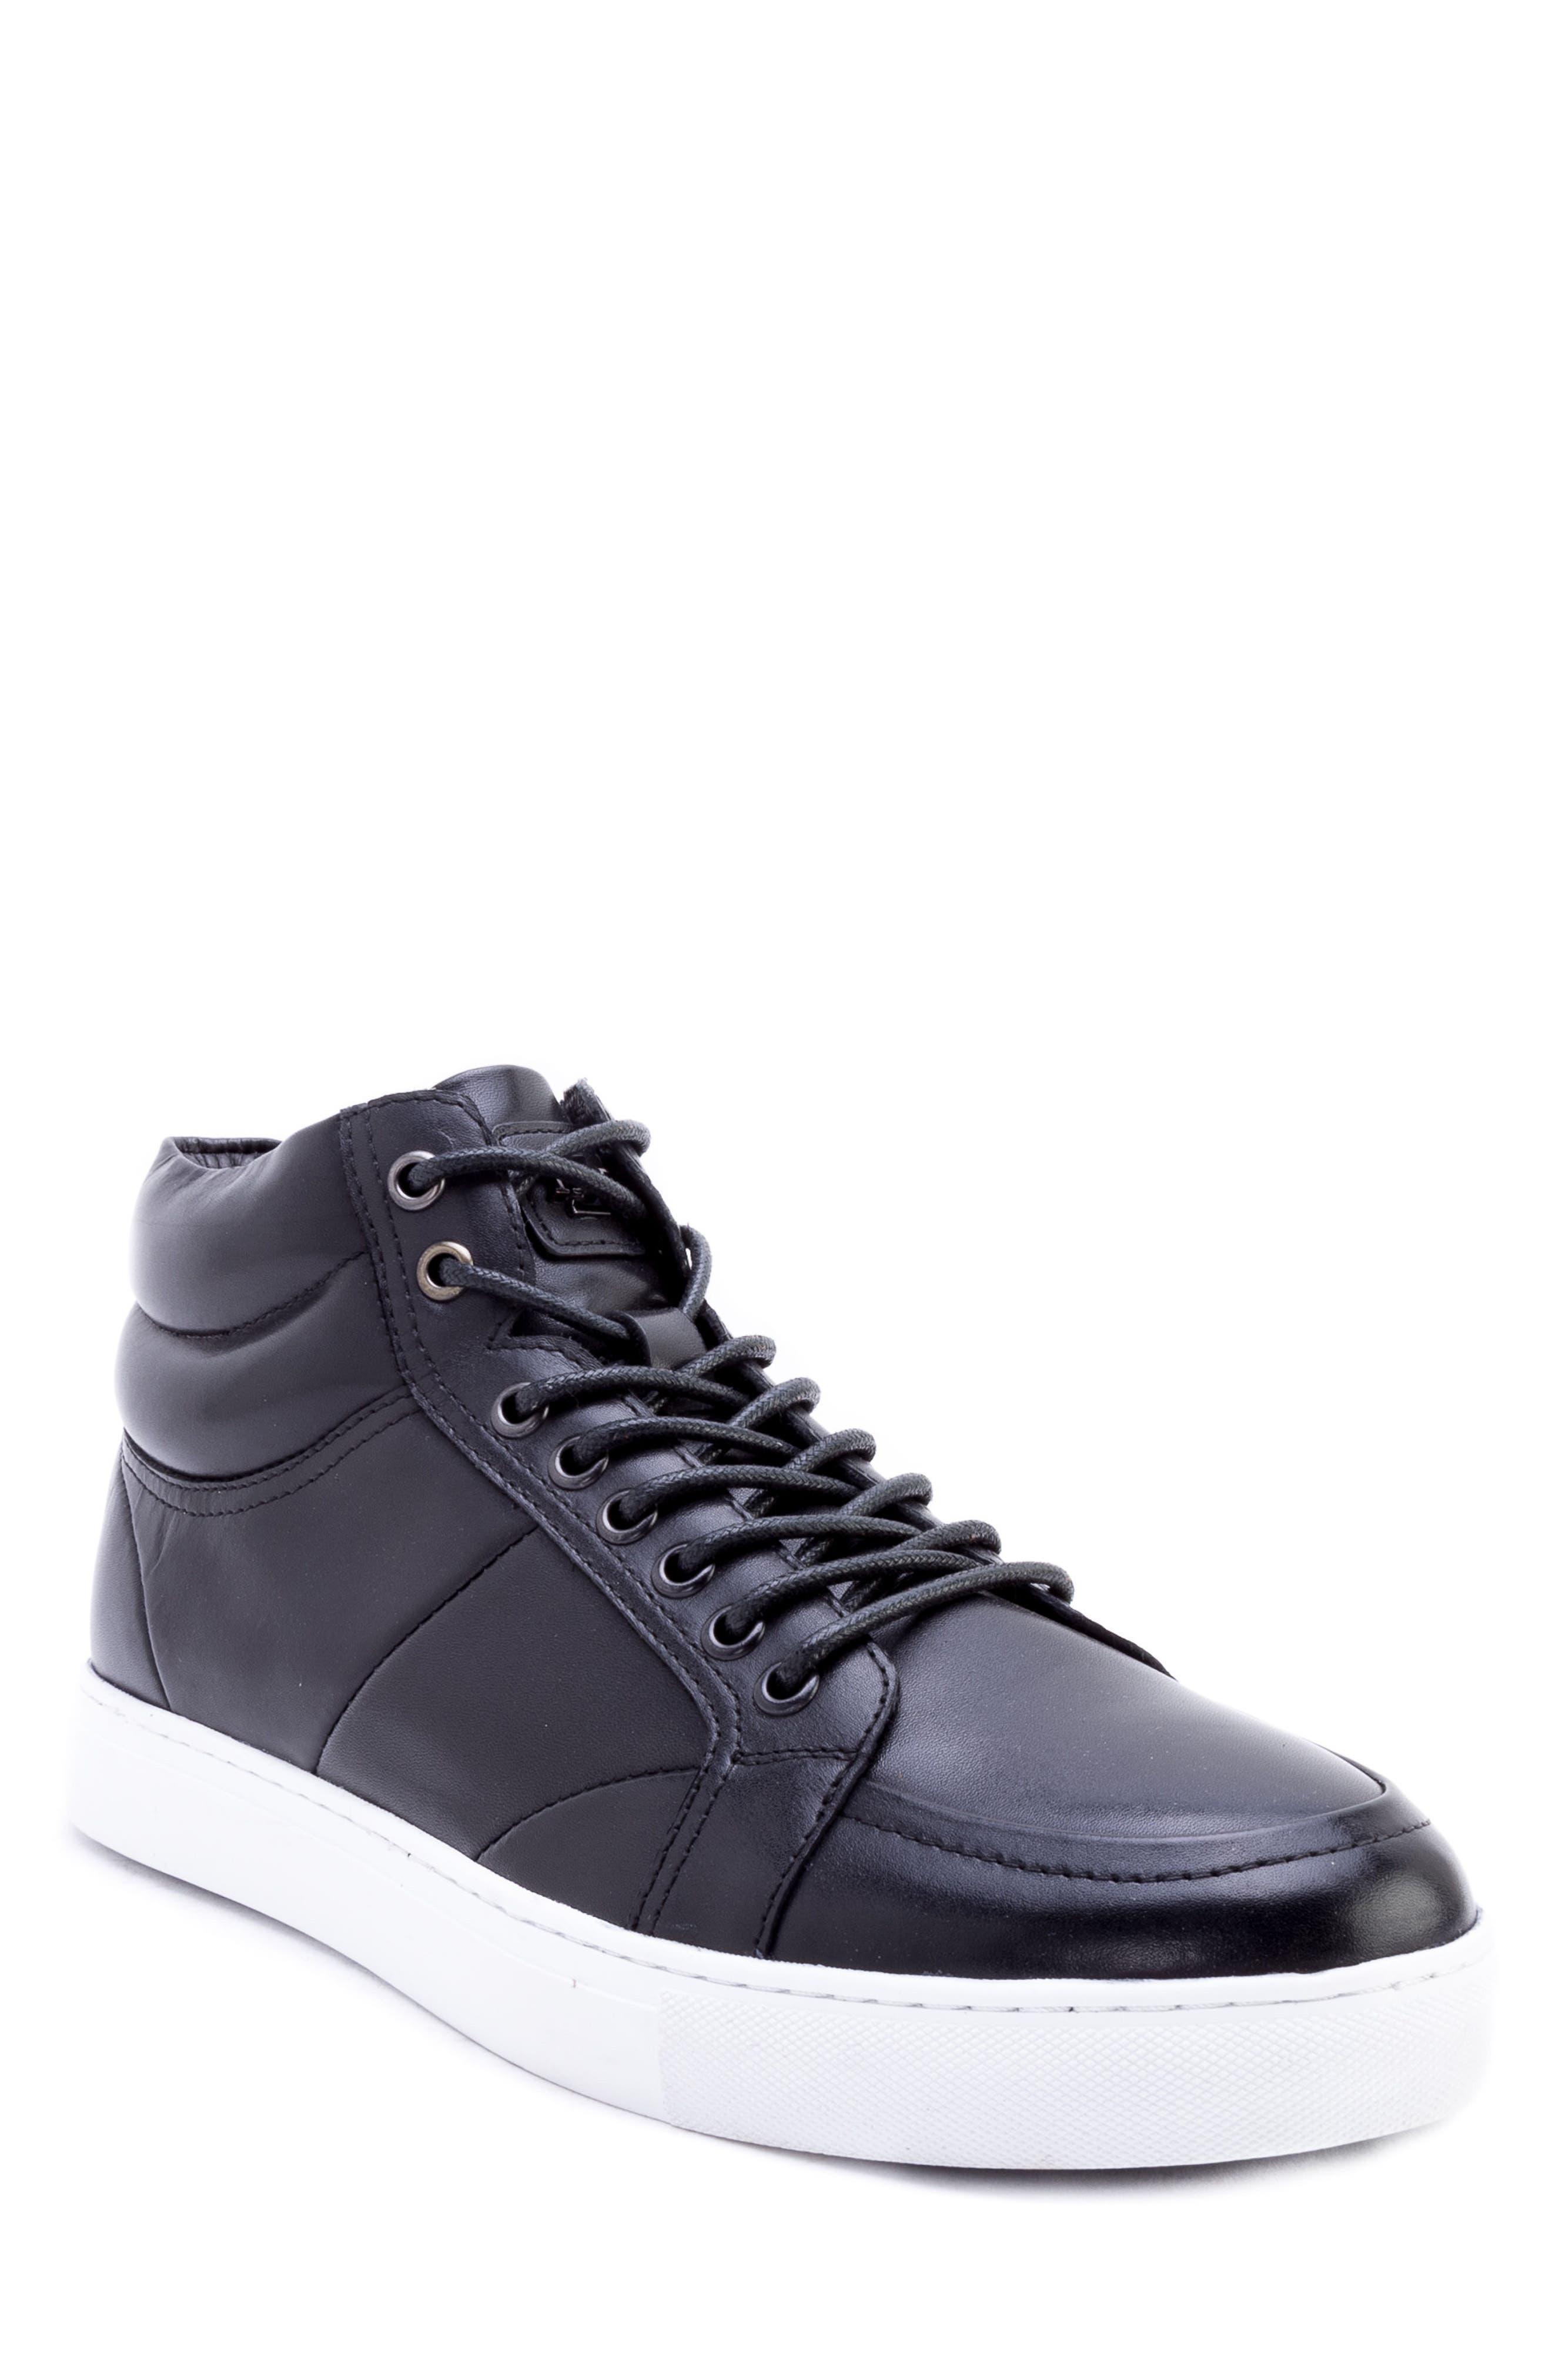 Tassel Mid Top Sneaker,                             Main thumbnail 1, color,                             BLACK LEATHER